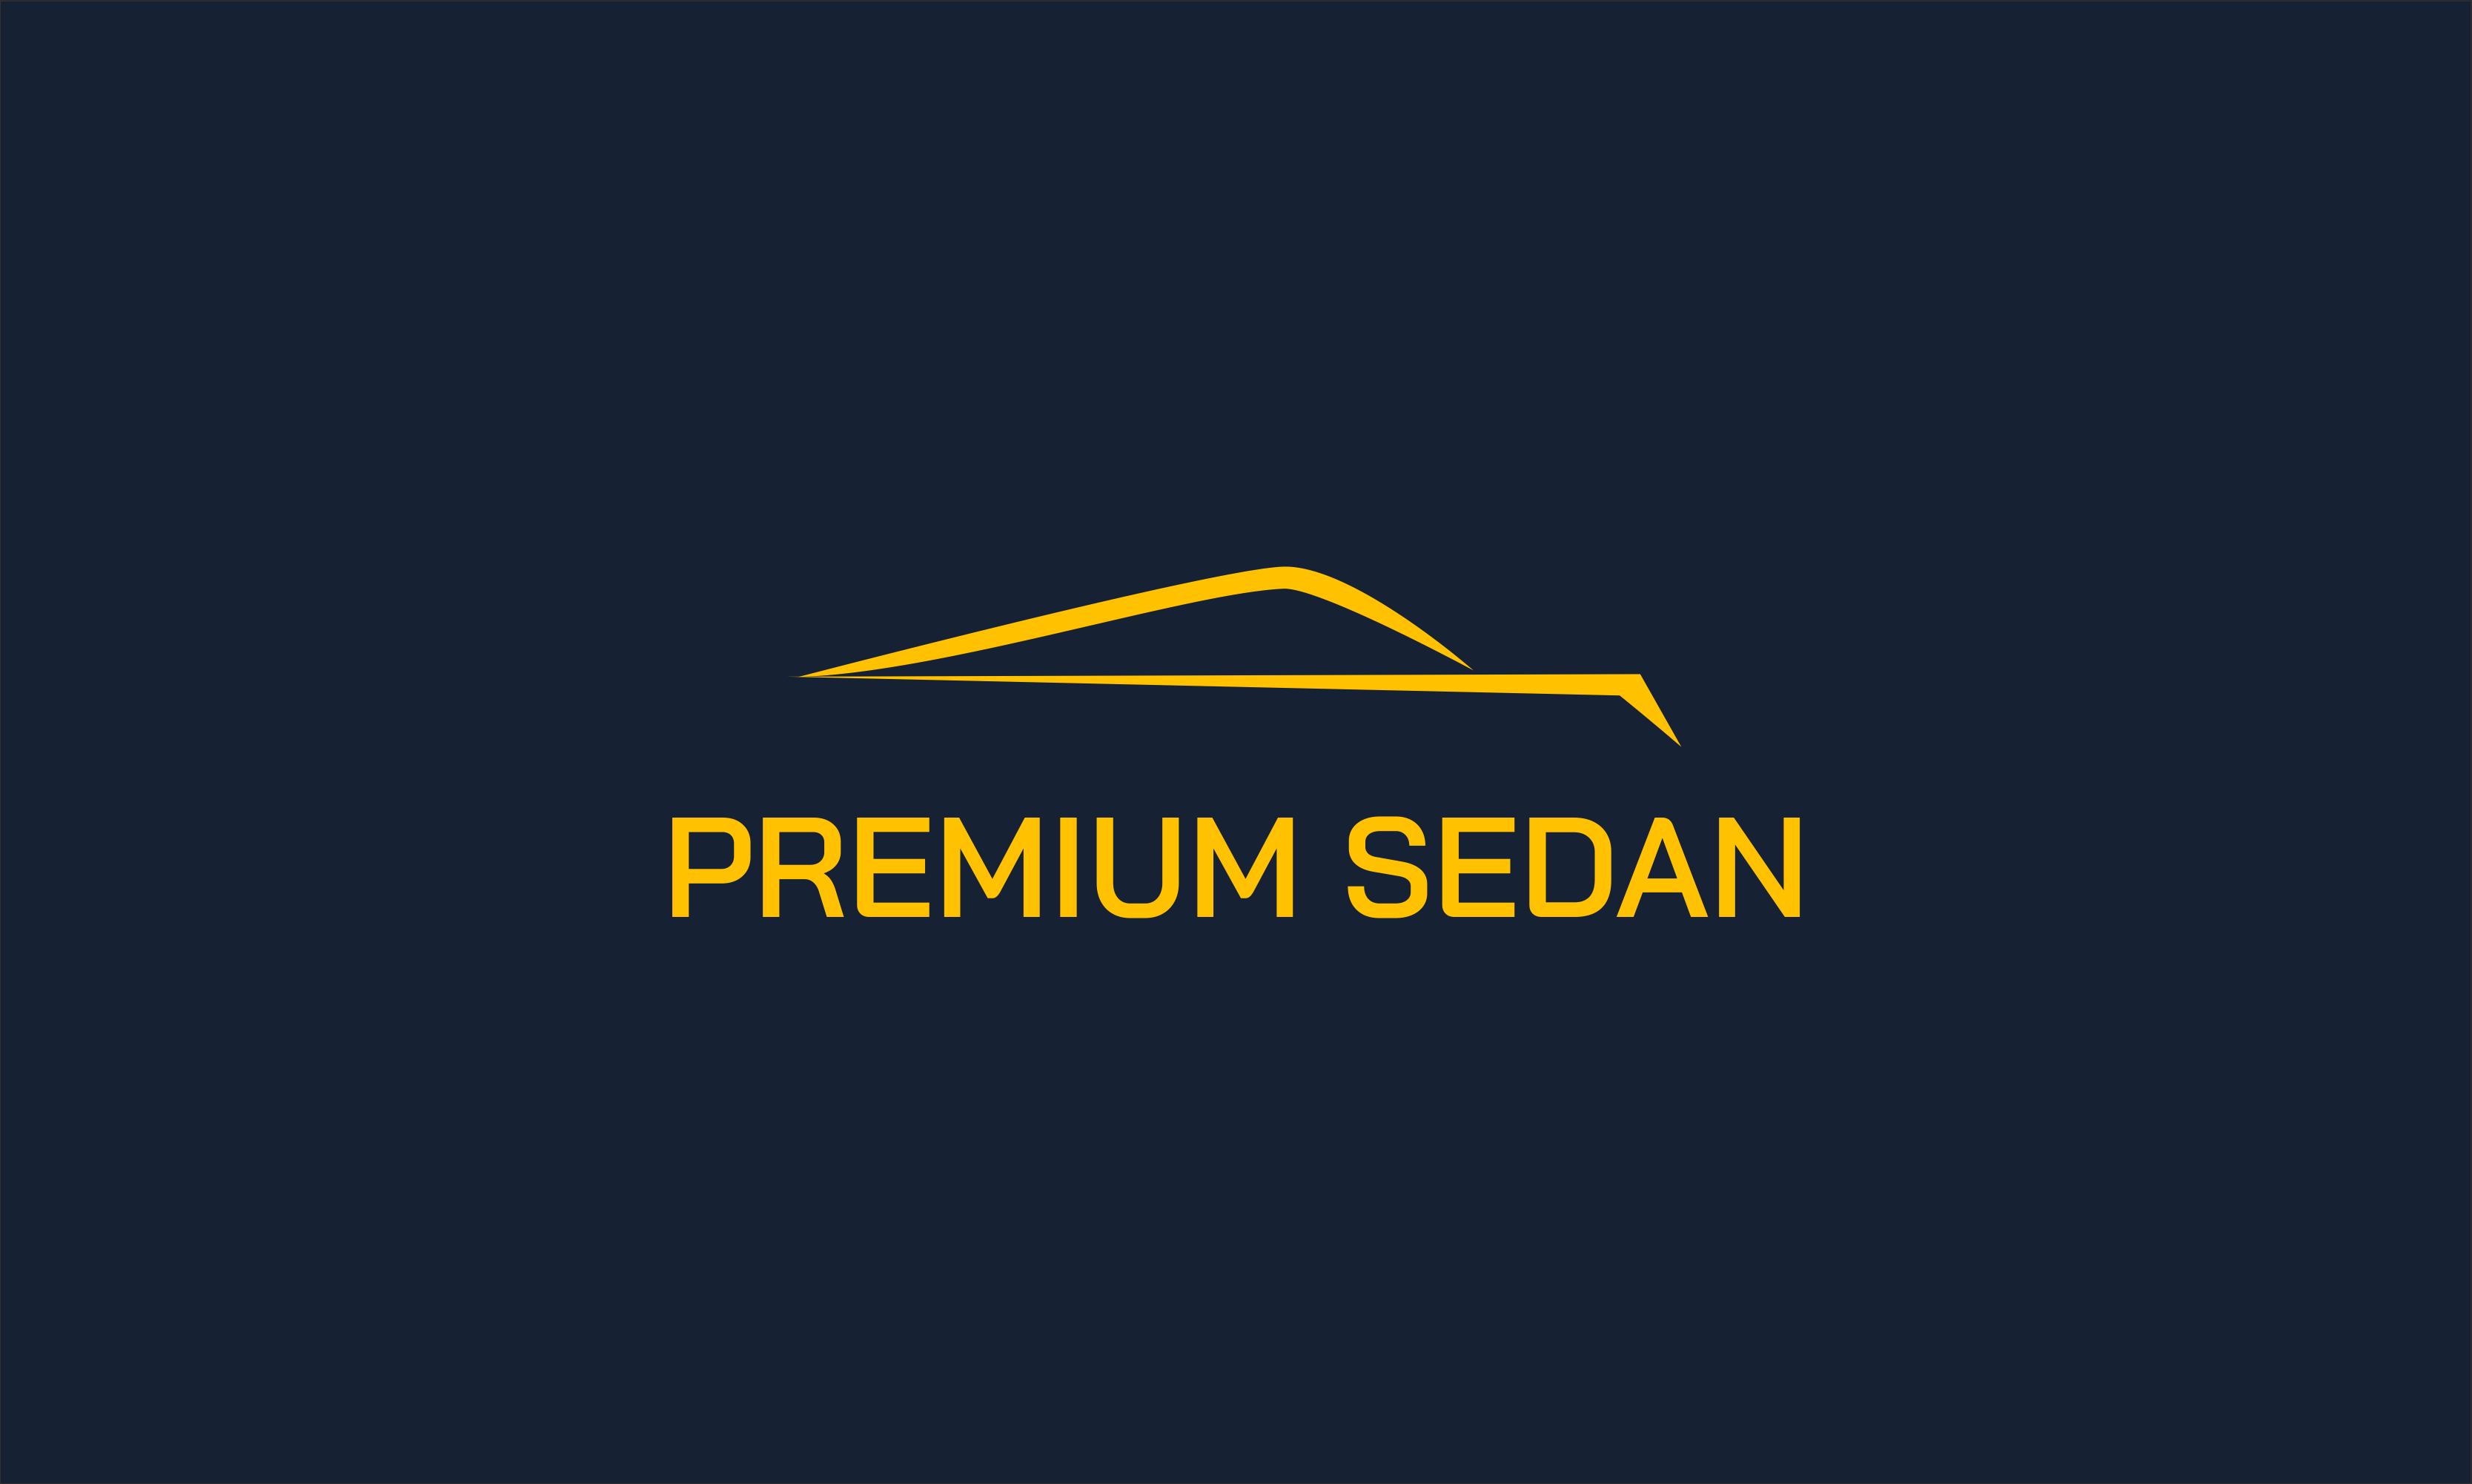 Premiumsedan